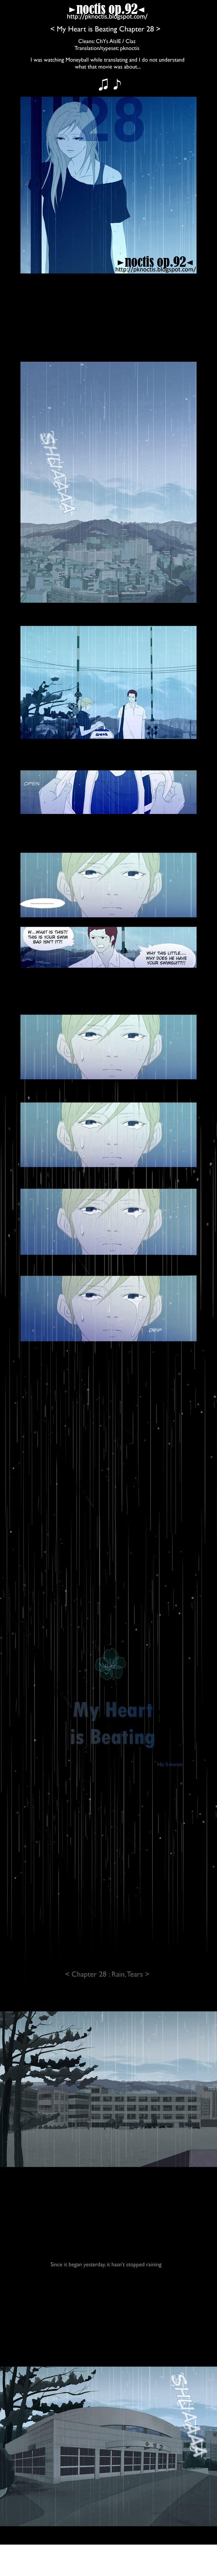 My Heart is Beating 28: Rain, Tears at MangaFox.la